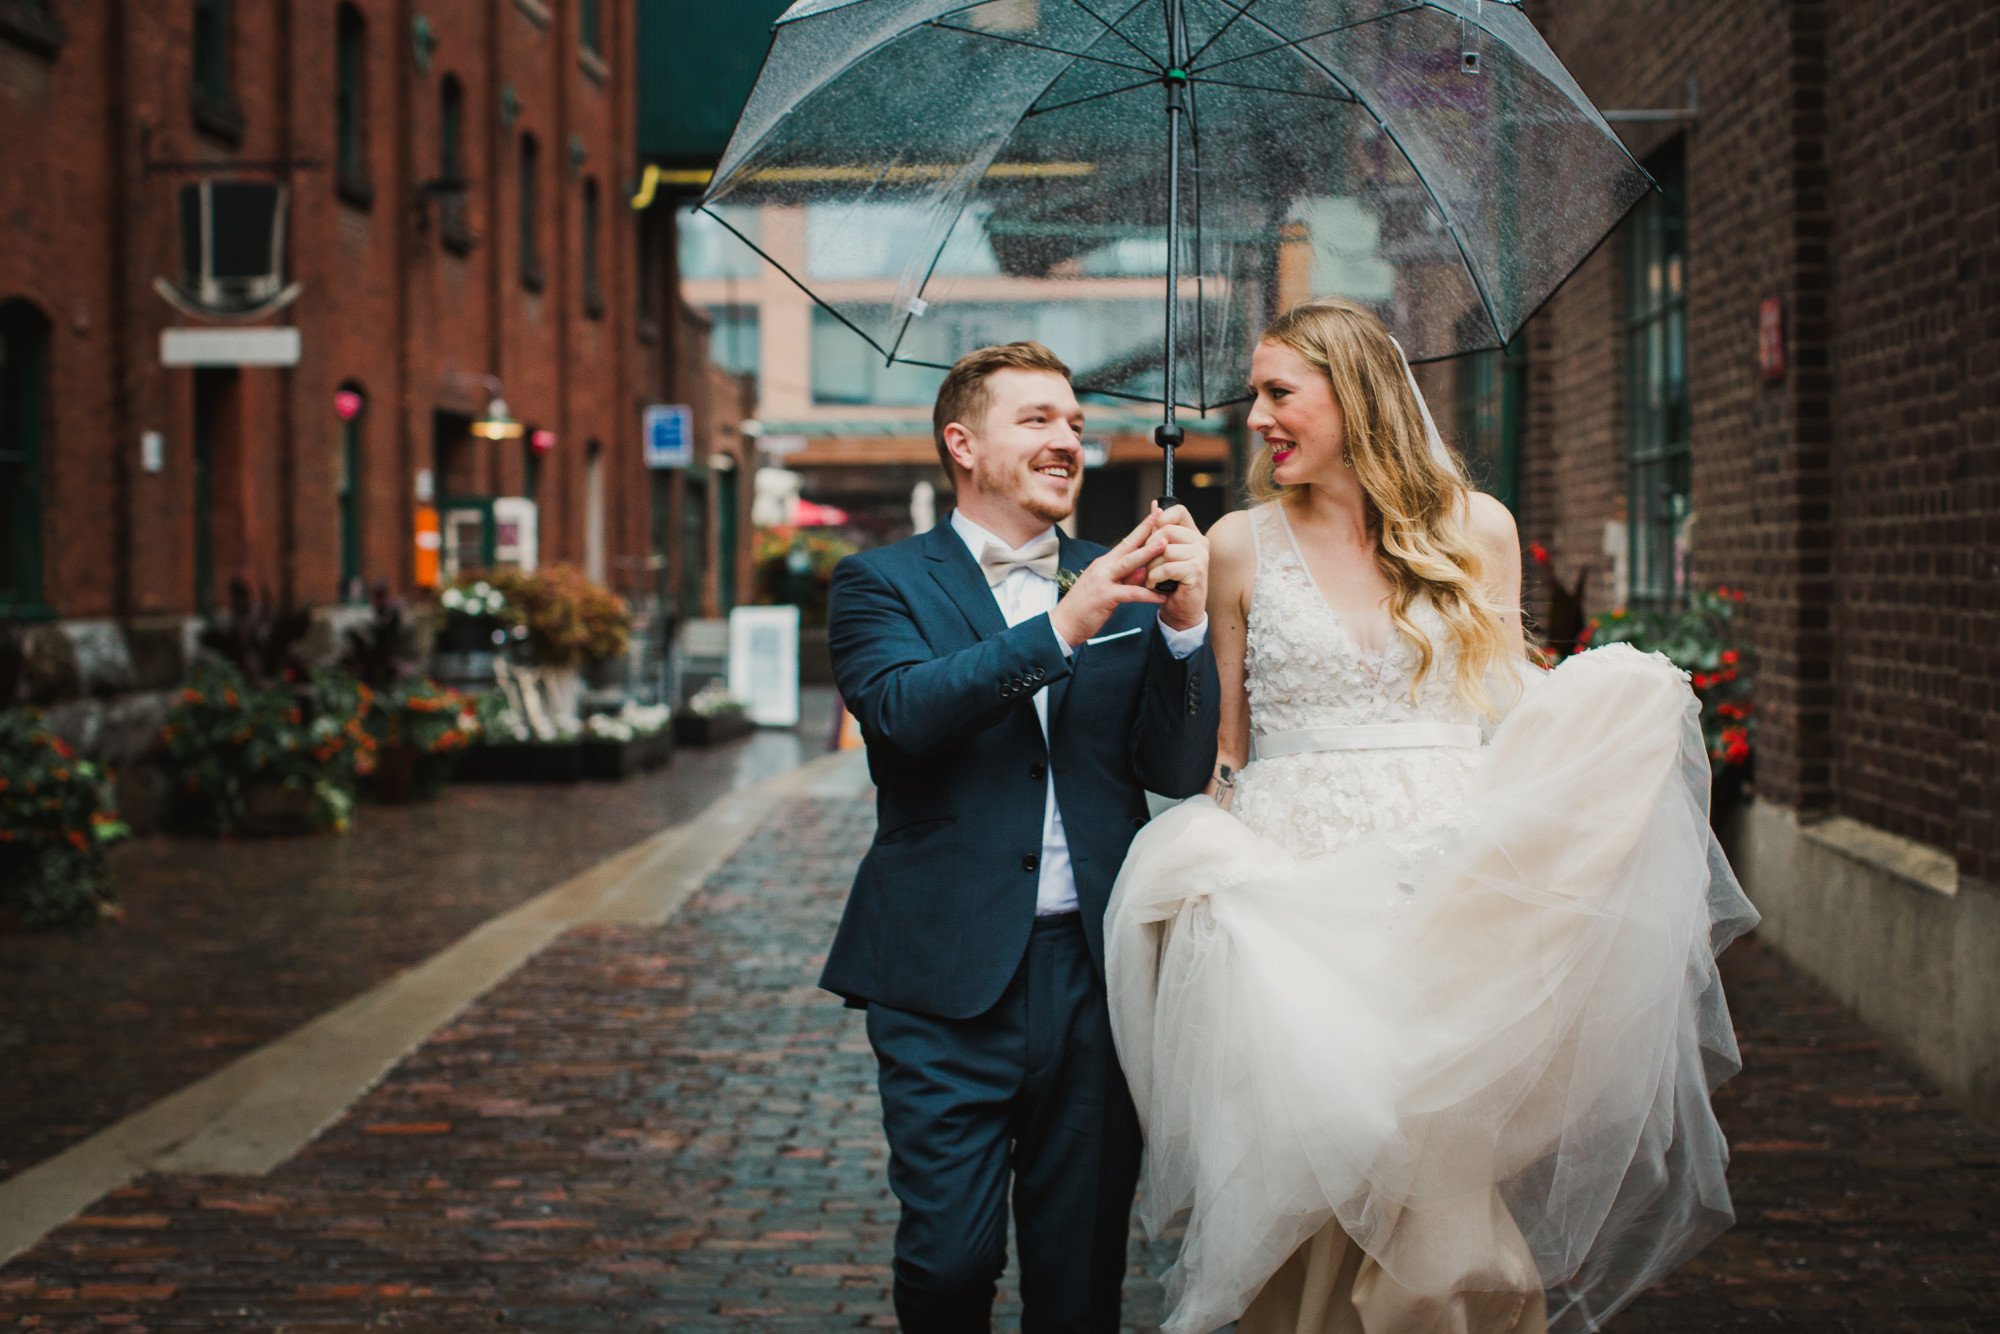 Beth-Ted-Balzacs-Coffee-Distillery-District-Toronto-Wedding-Planning-INLY-Events-Lushana-Bale-Photography-0110.jpg